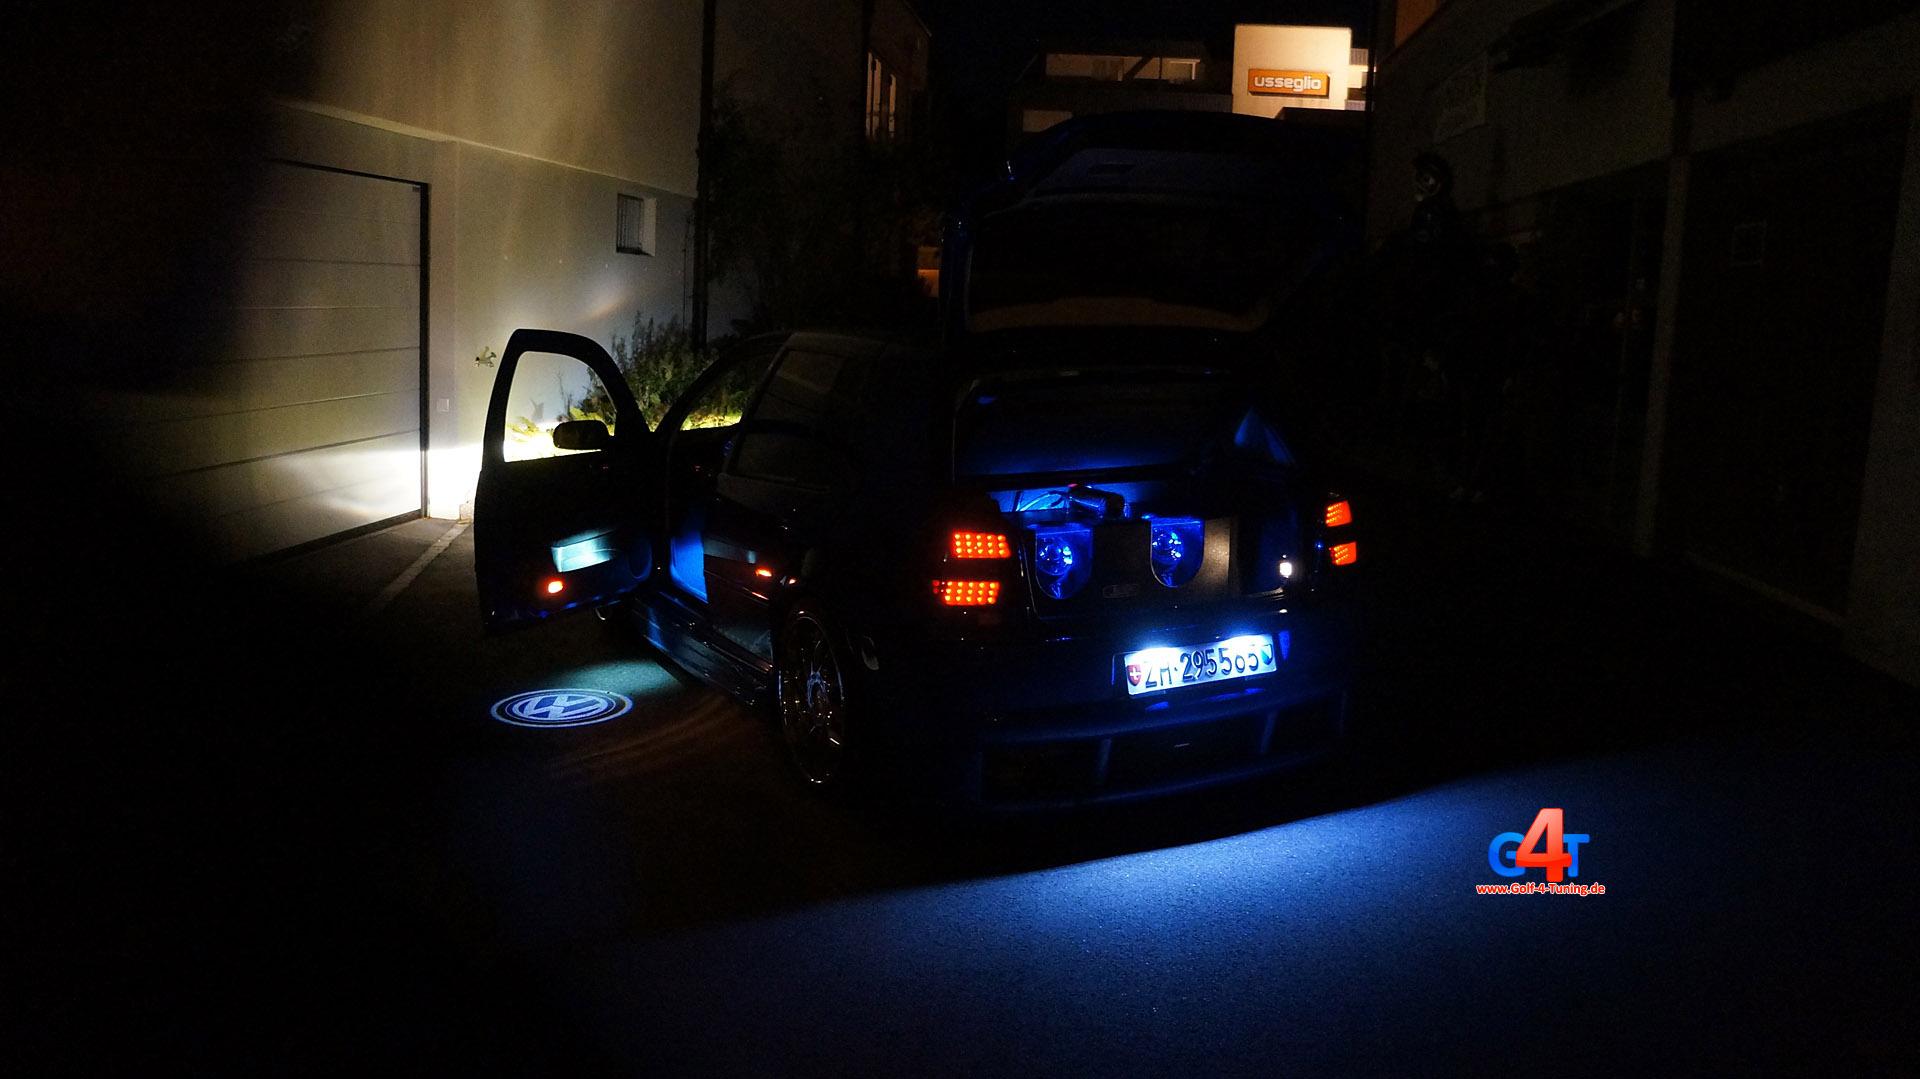 Auto Beleuchtung Tuning | Golf 4 Subwoofer Ubb Logo Led Licht Carlight